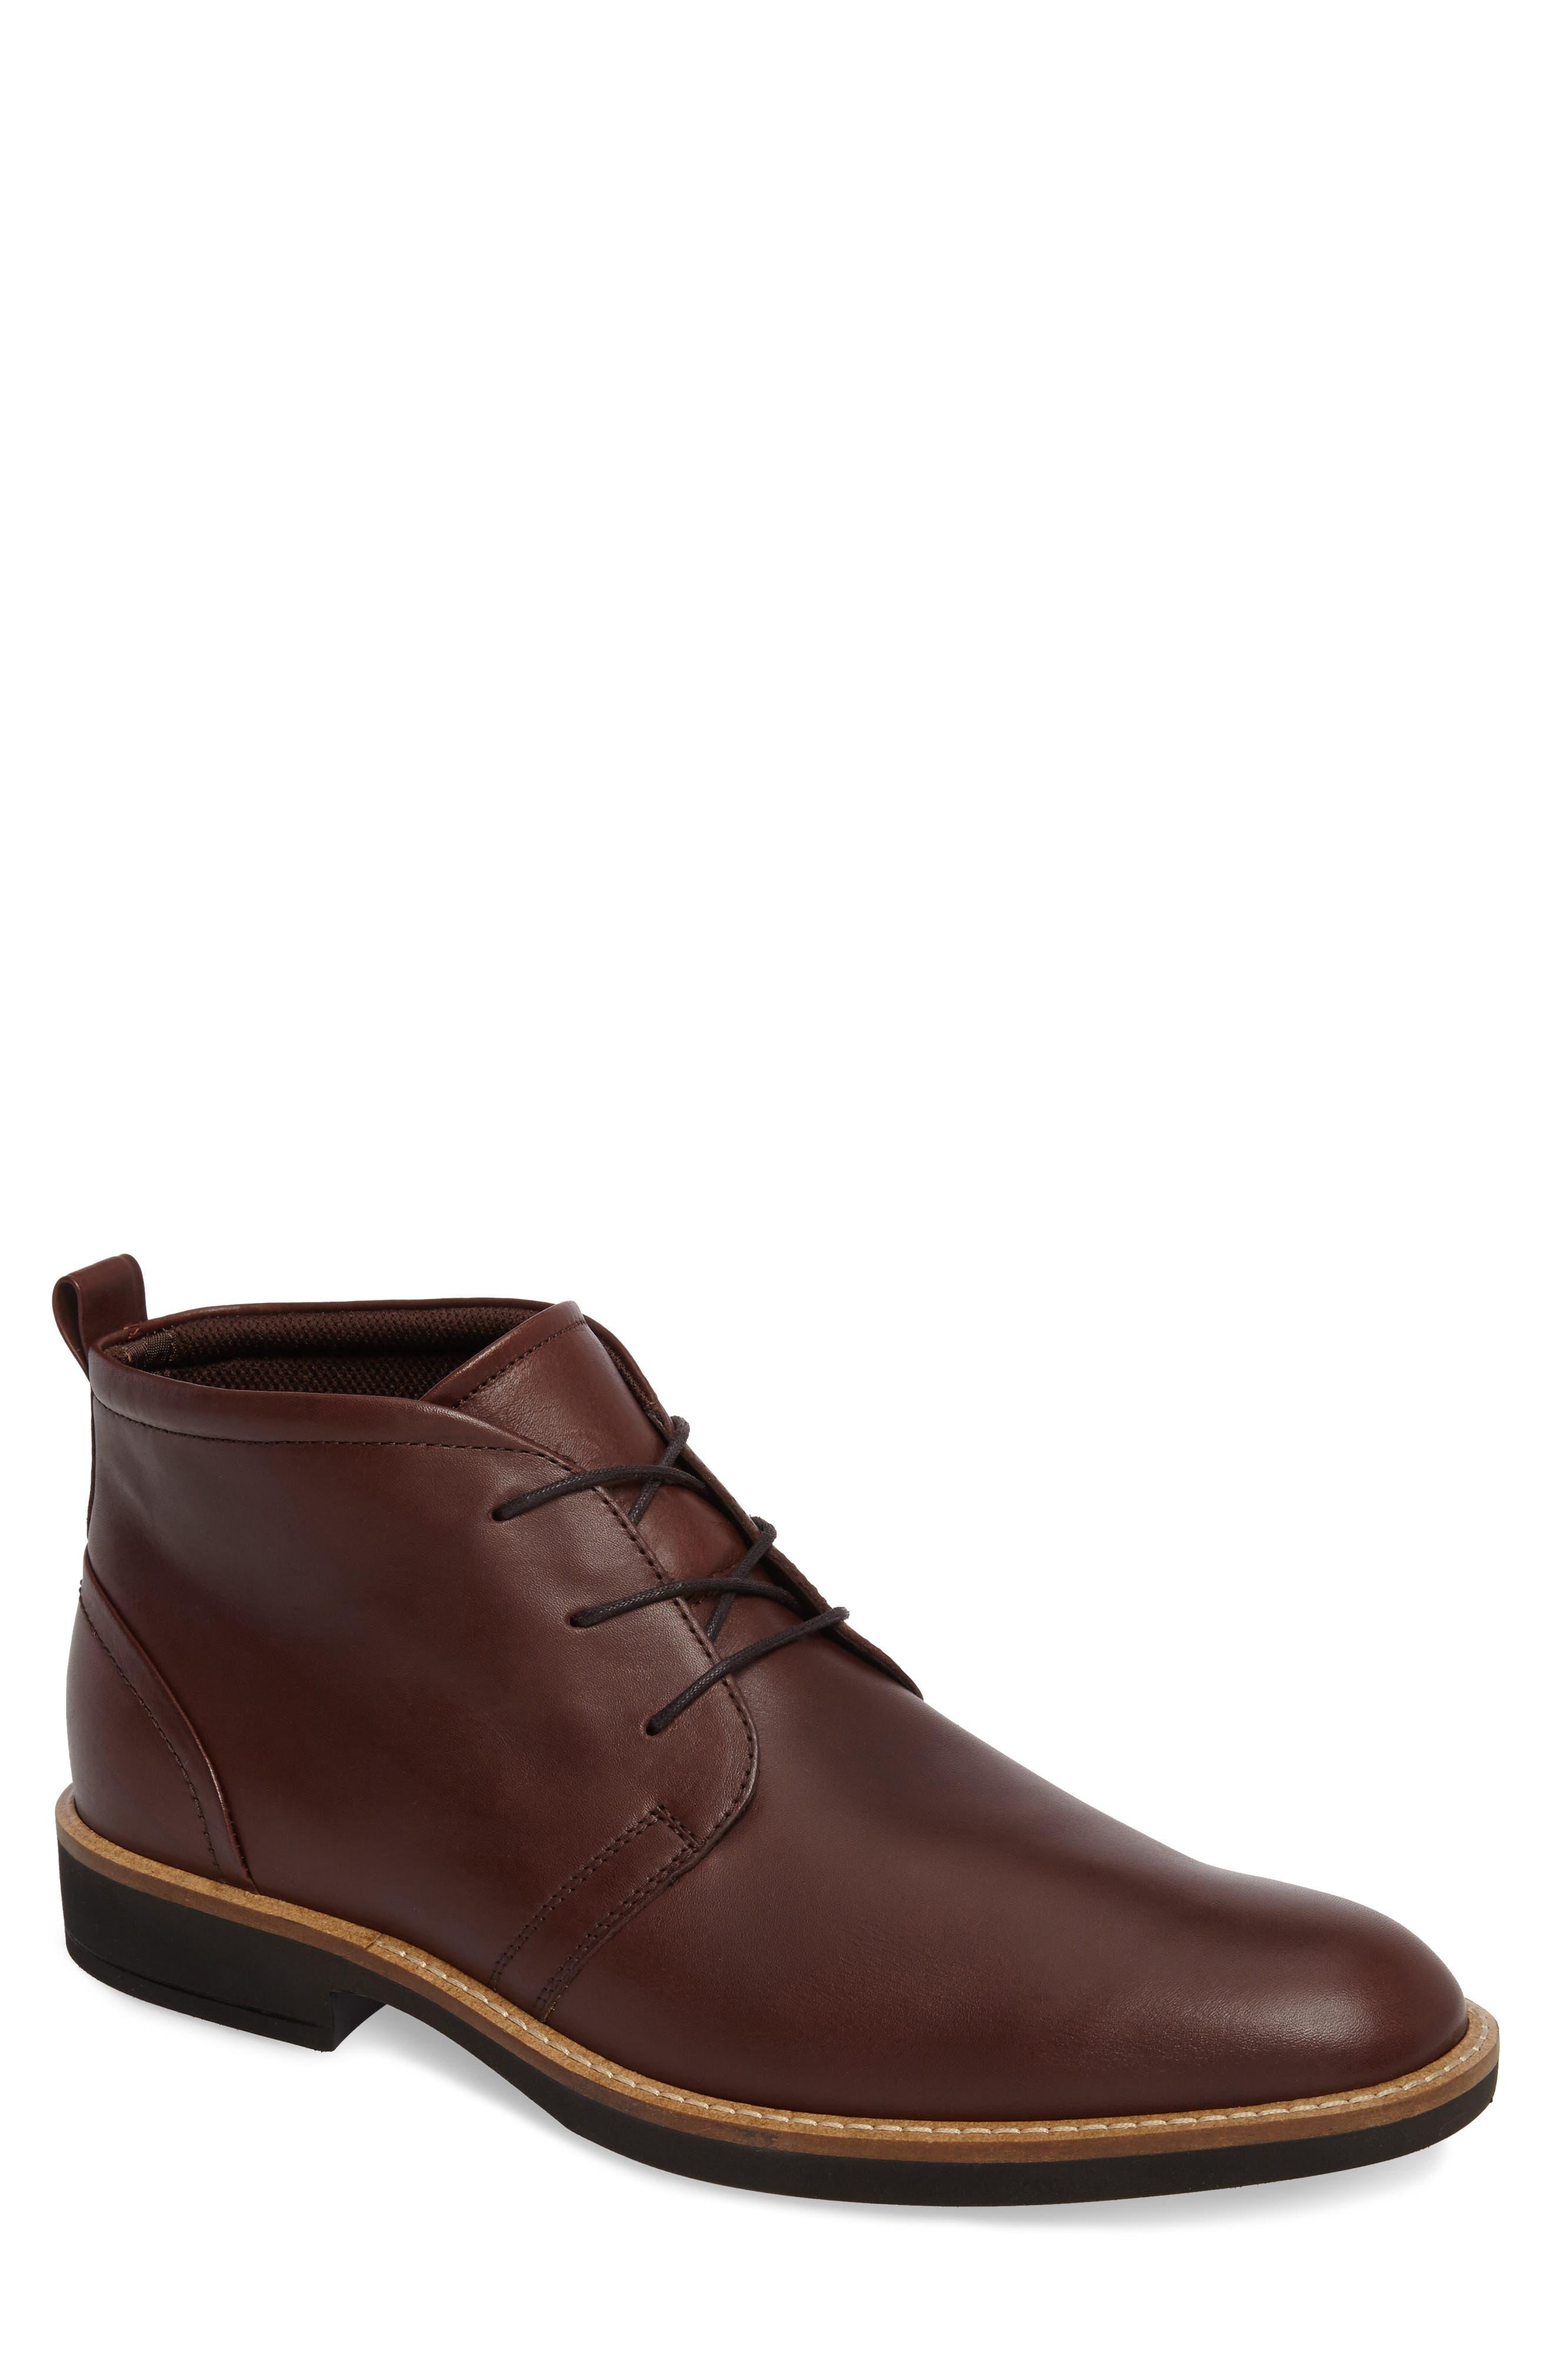 Biarritz Chukka Boot,                             Main thumbnail 1, color,                             Rust Leather